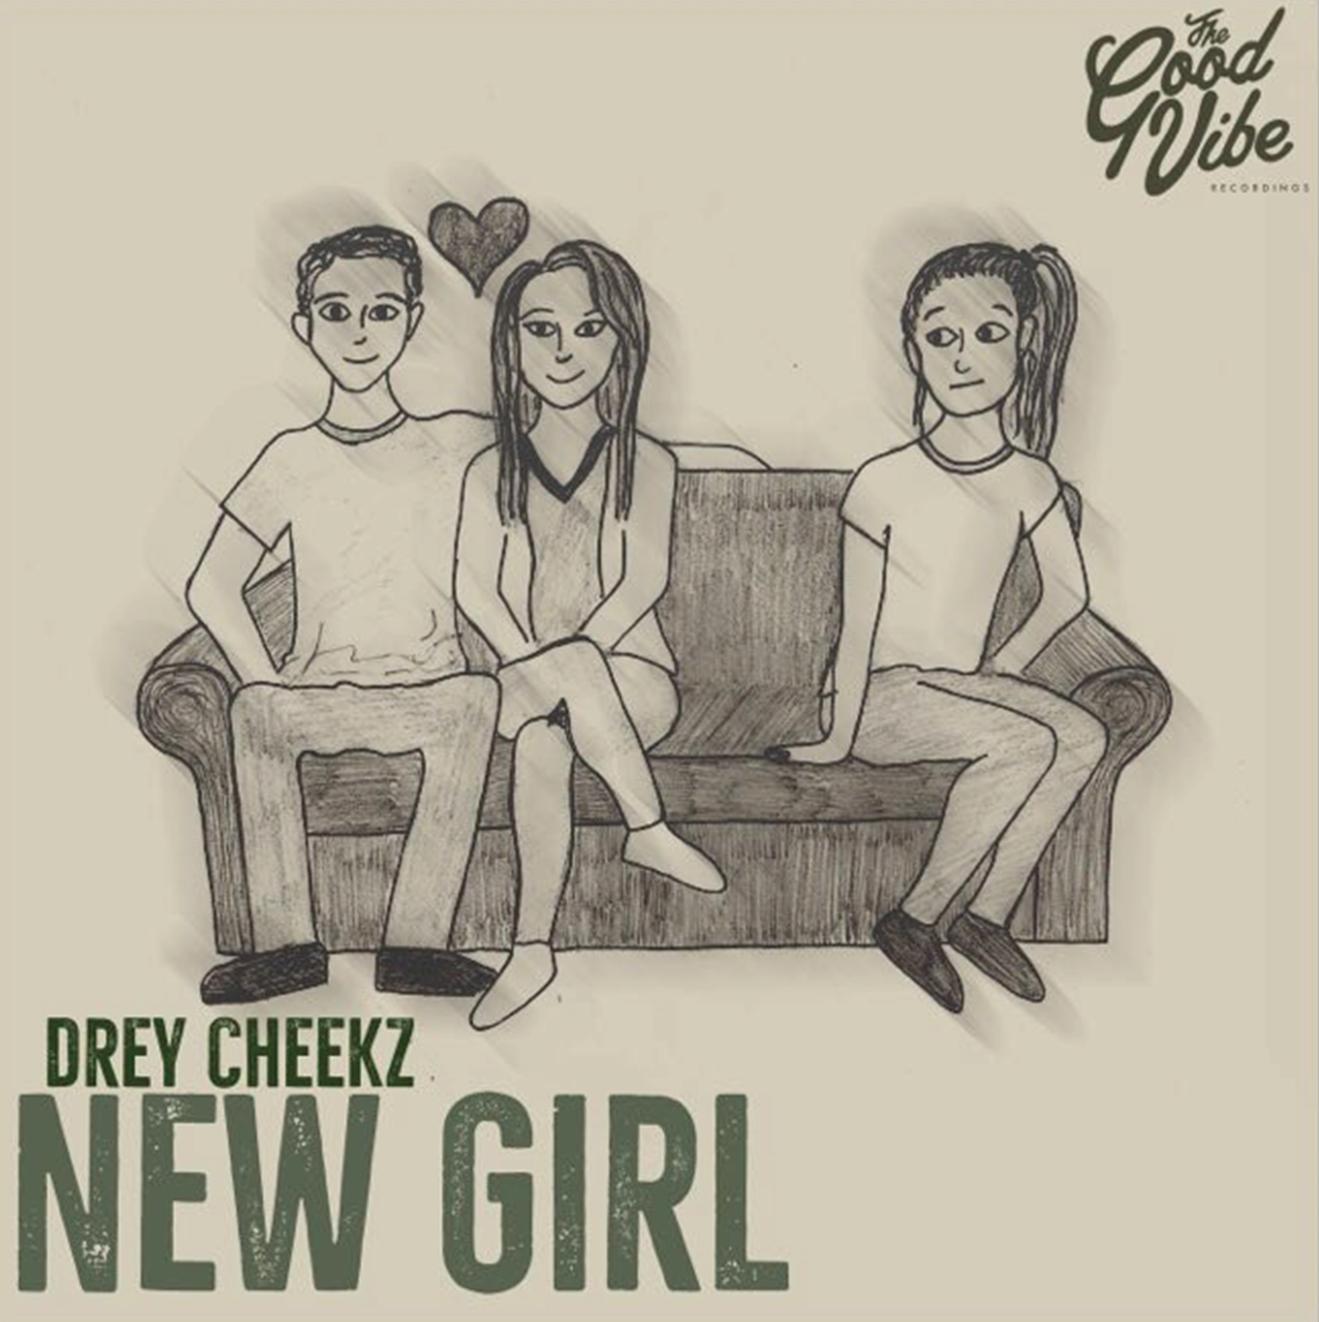 drey-cheekz-05-12-2016andrew